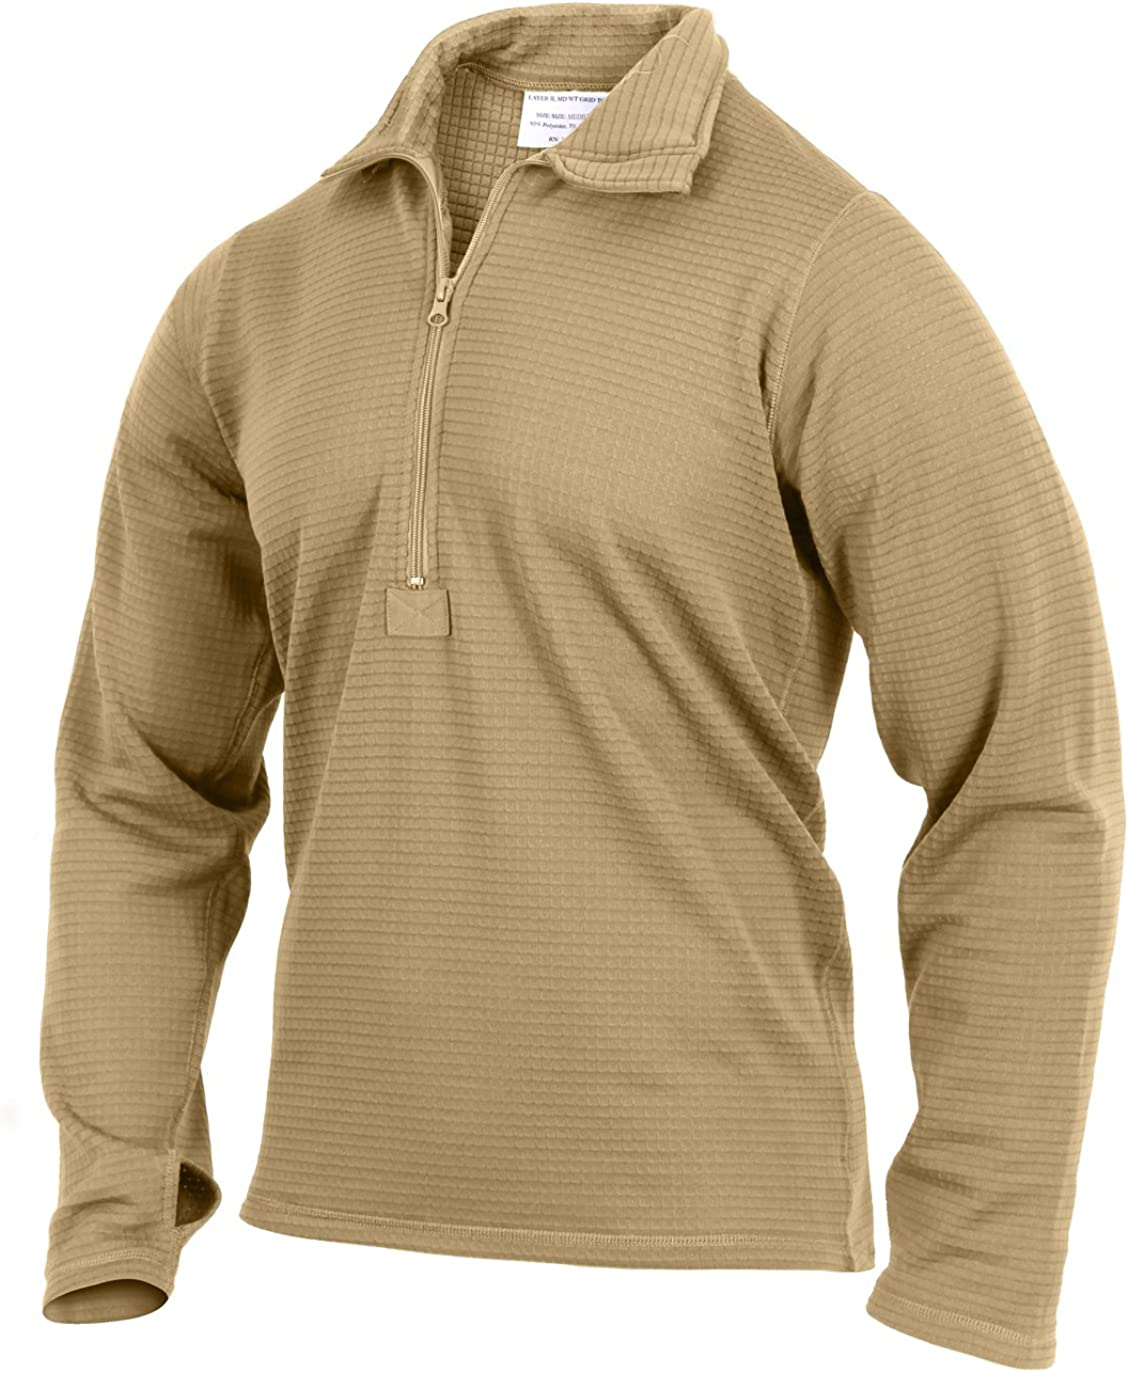 Rothco ECWCS Gen III Mid-Weight Underwear Top (Level II): Clothing